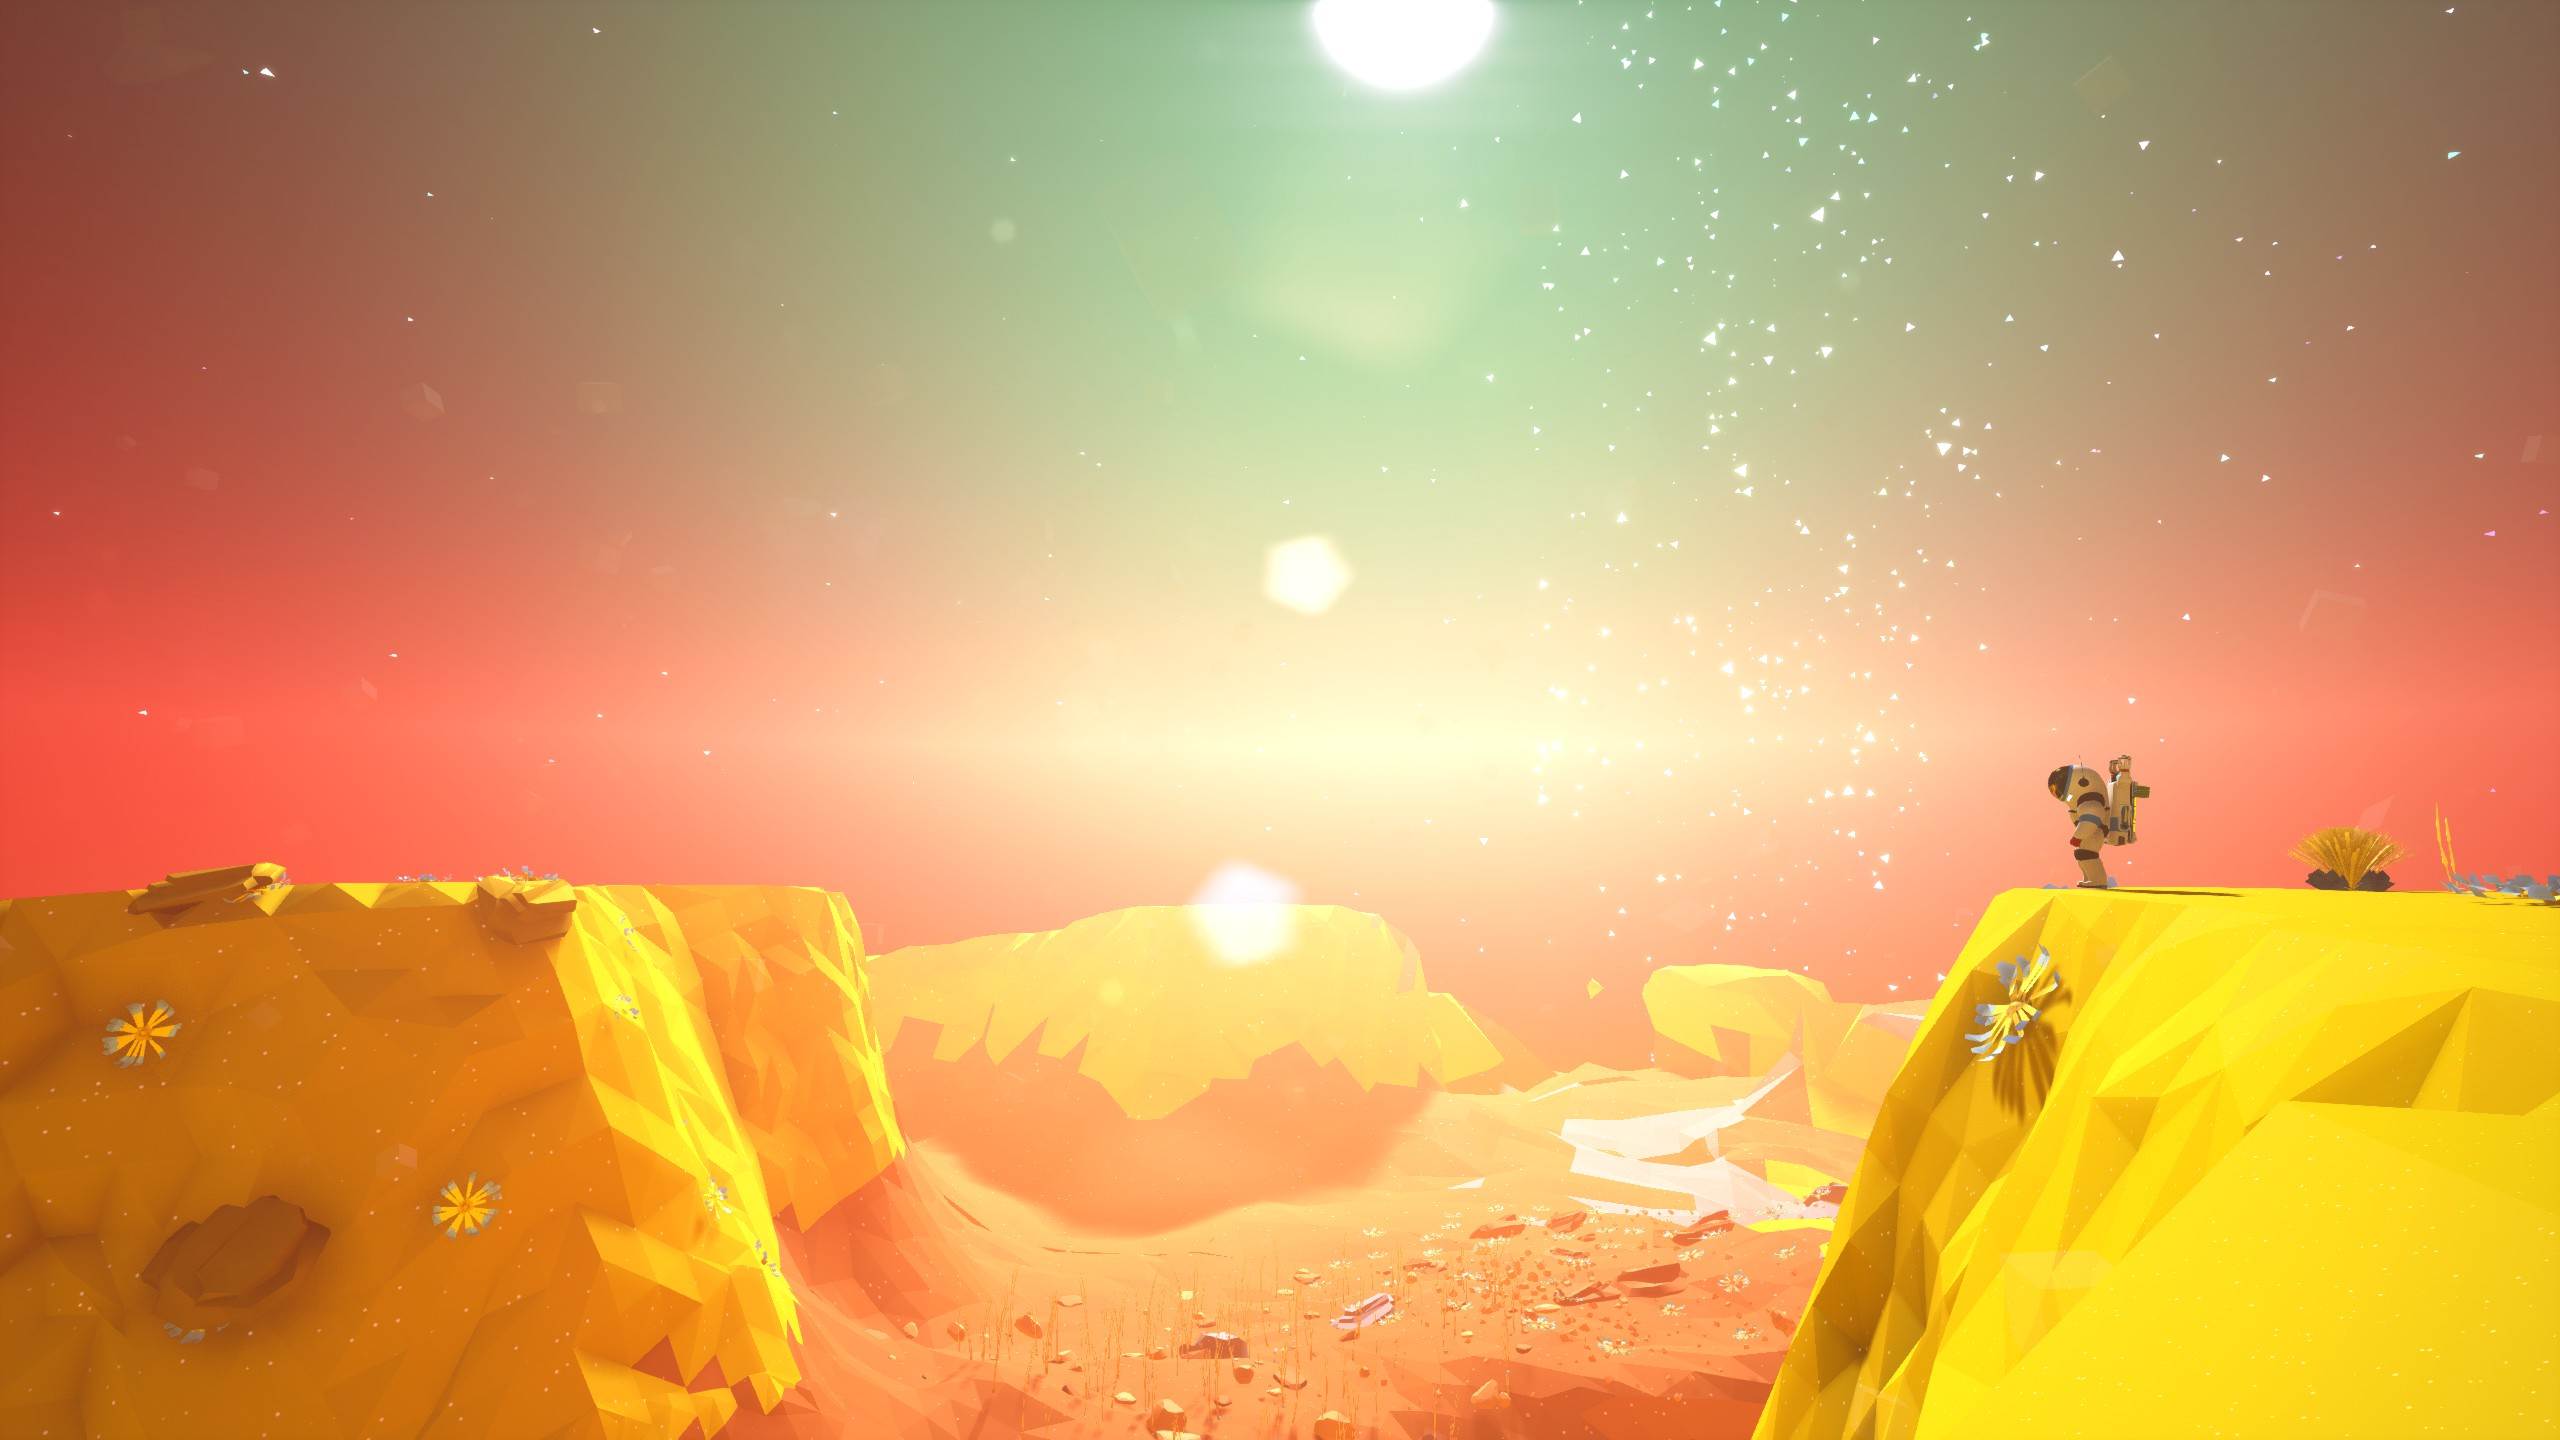 astroneer game background wallpaper 69475